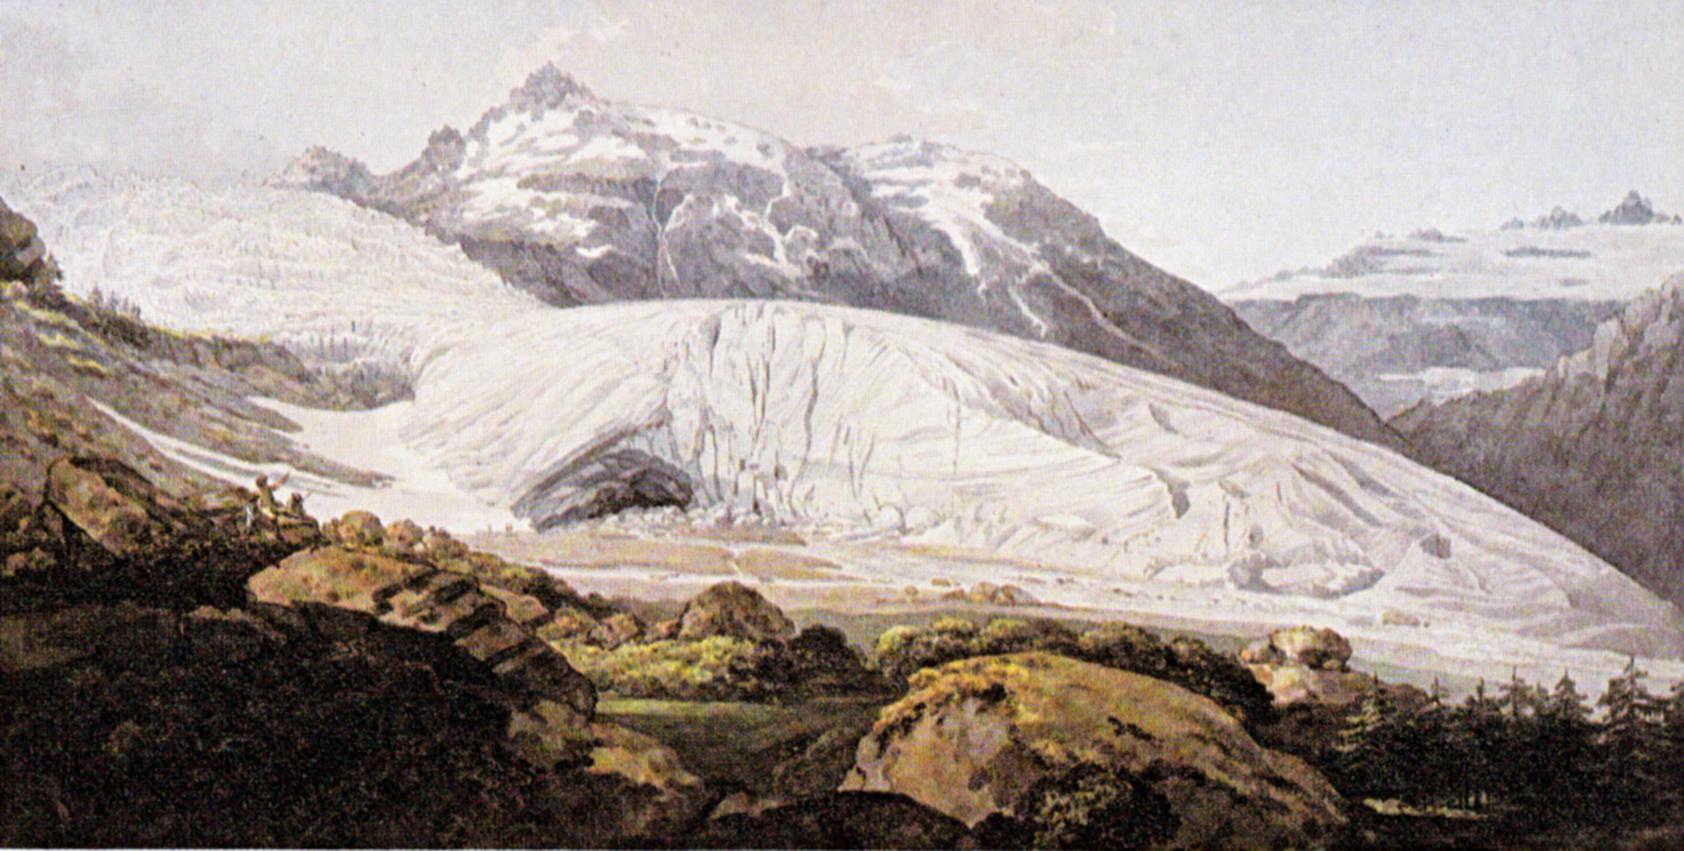 William Pars, the Rhone glacier in Switzerland, 1770